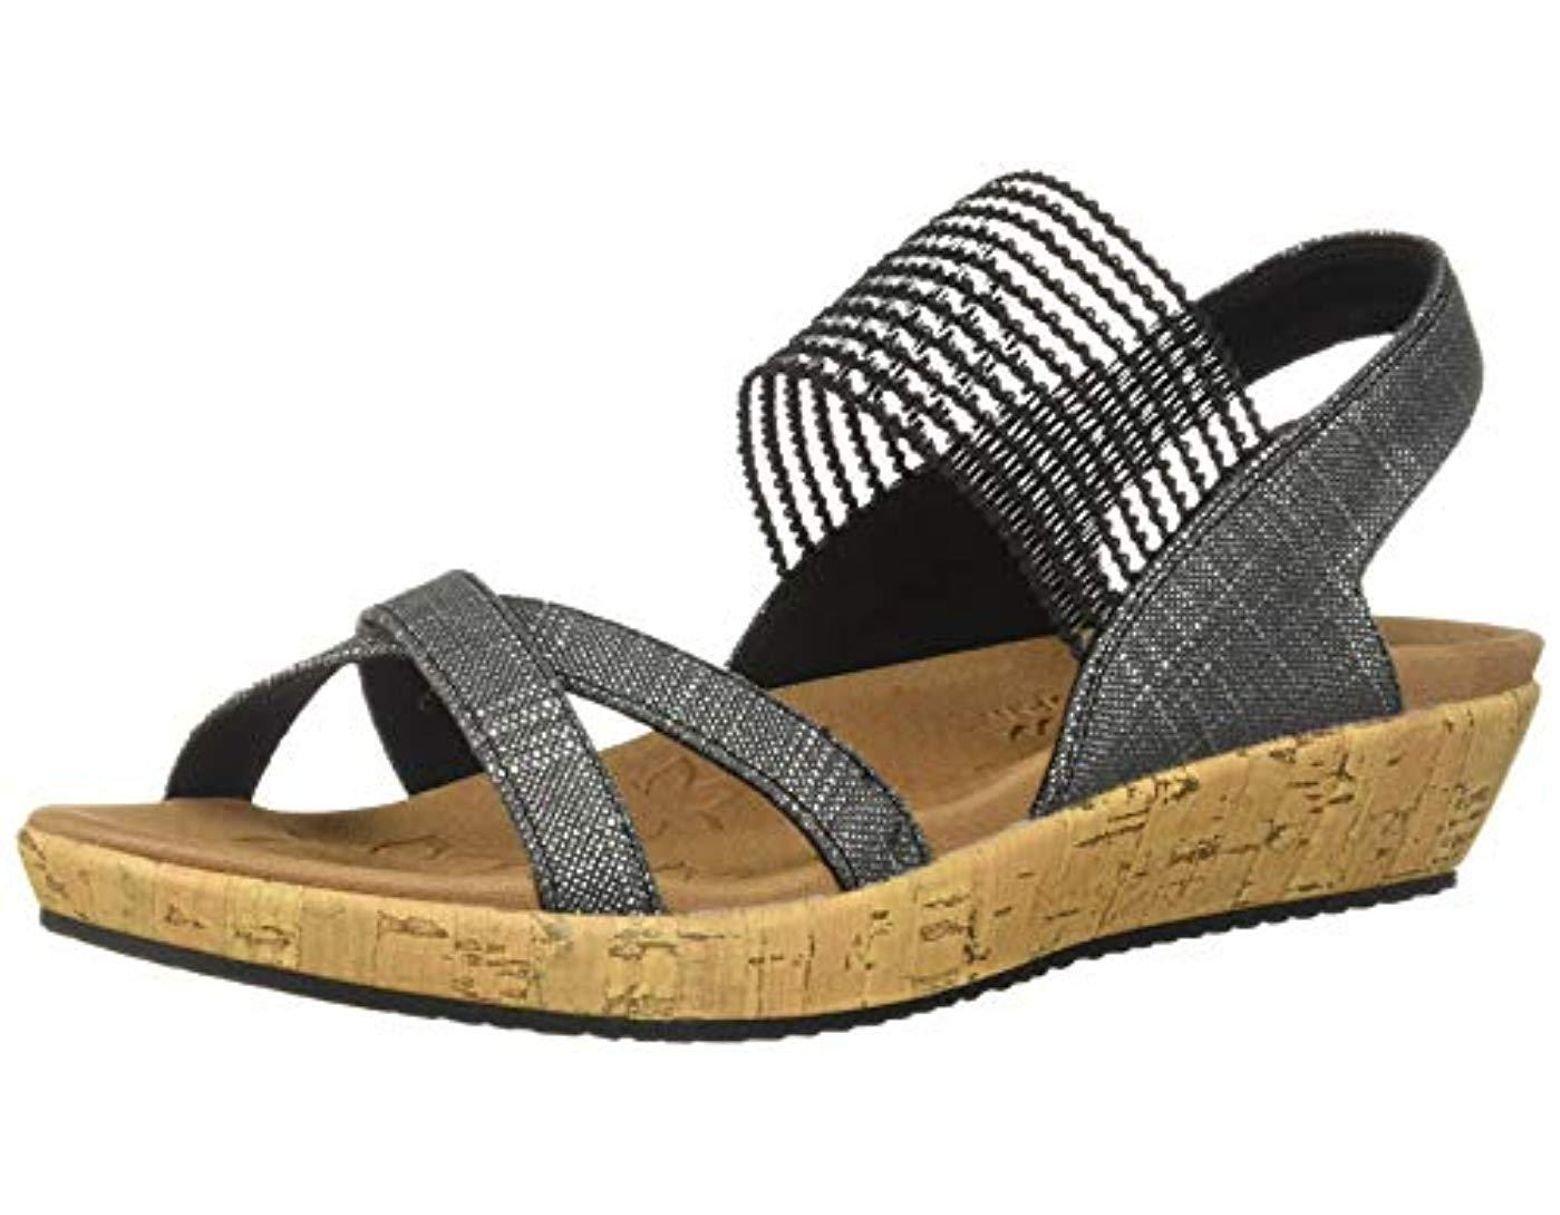 ce0a1672 Skechers Brie-dawdle-sparkle Stretch Vamp Sling Back Sandal in Black - Save  12% - Lyst